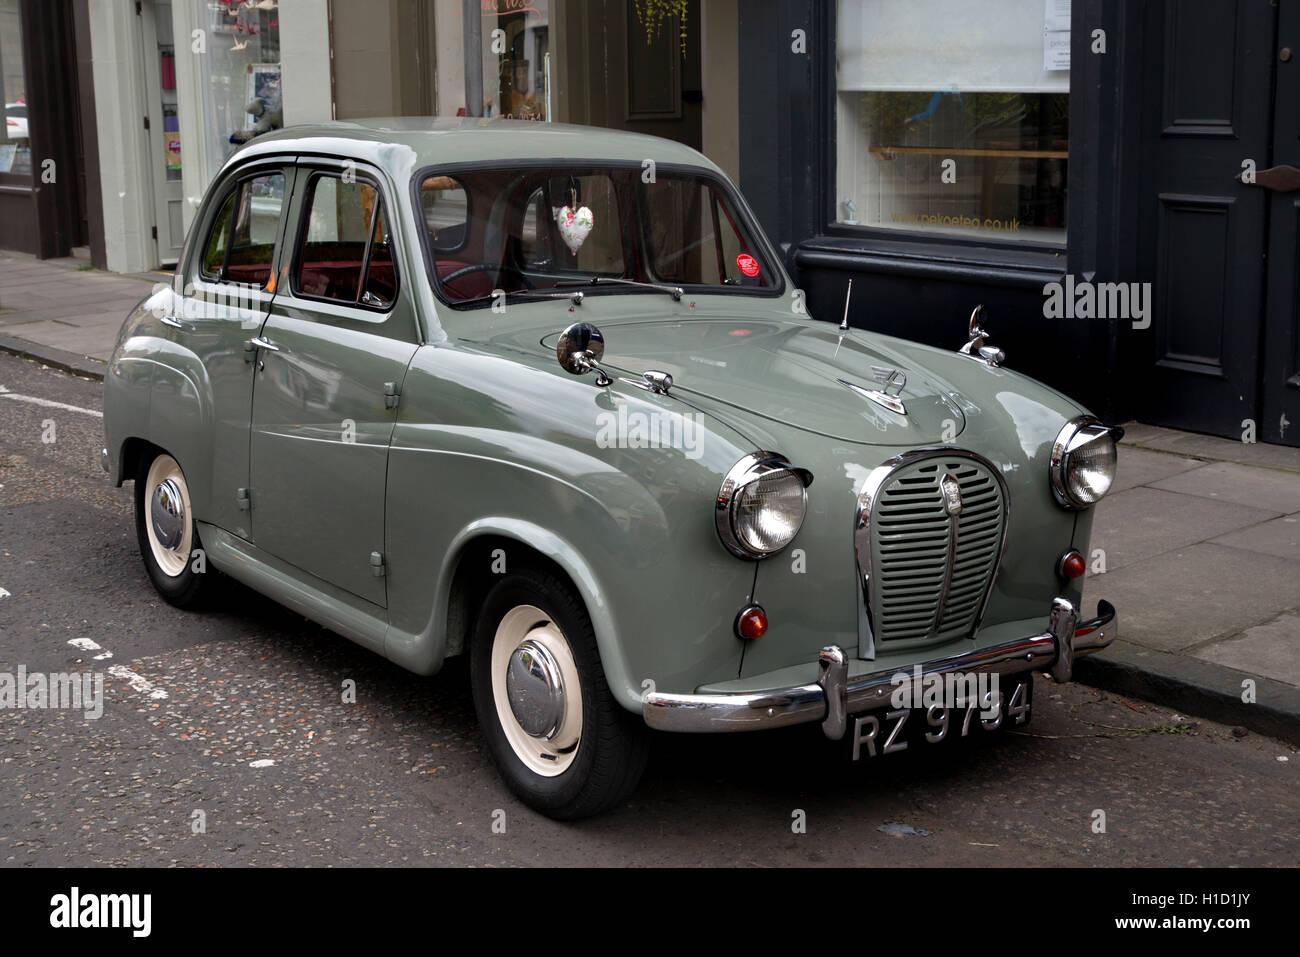 Vintage Morris Minor car parked in Stockbridge, Edinburgh, Scotland, UK. - Stock Image